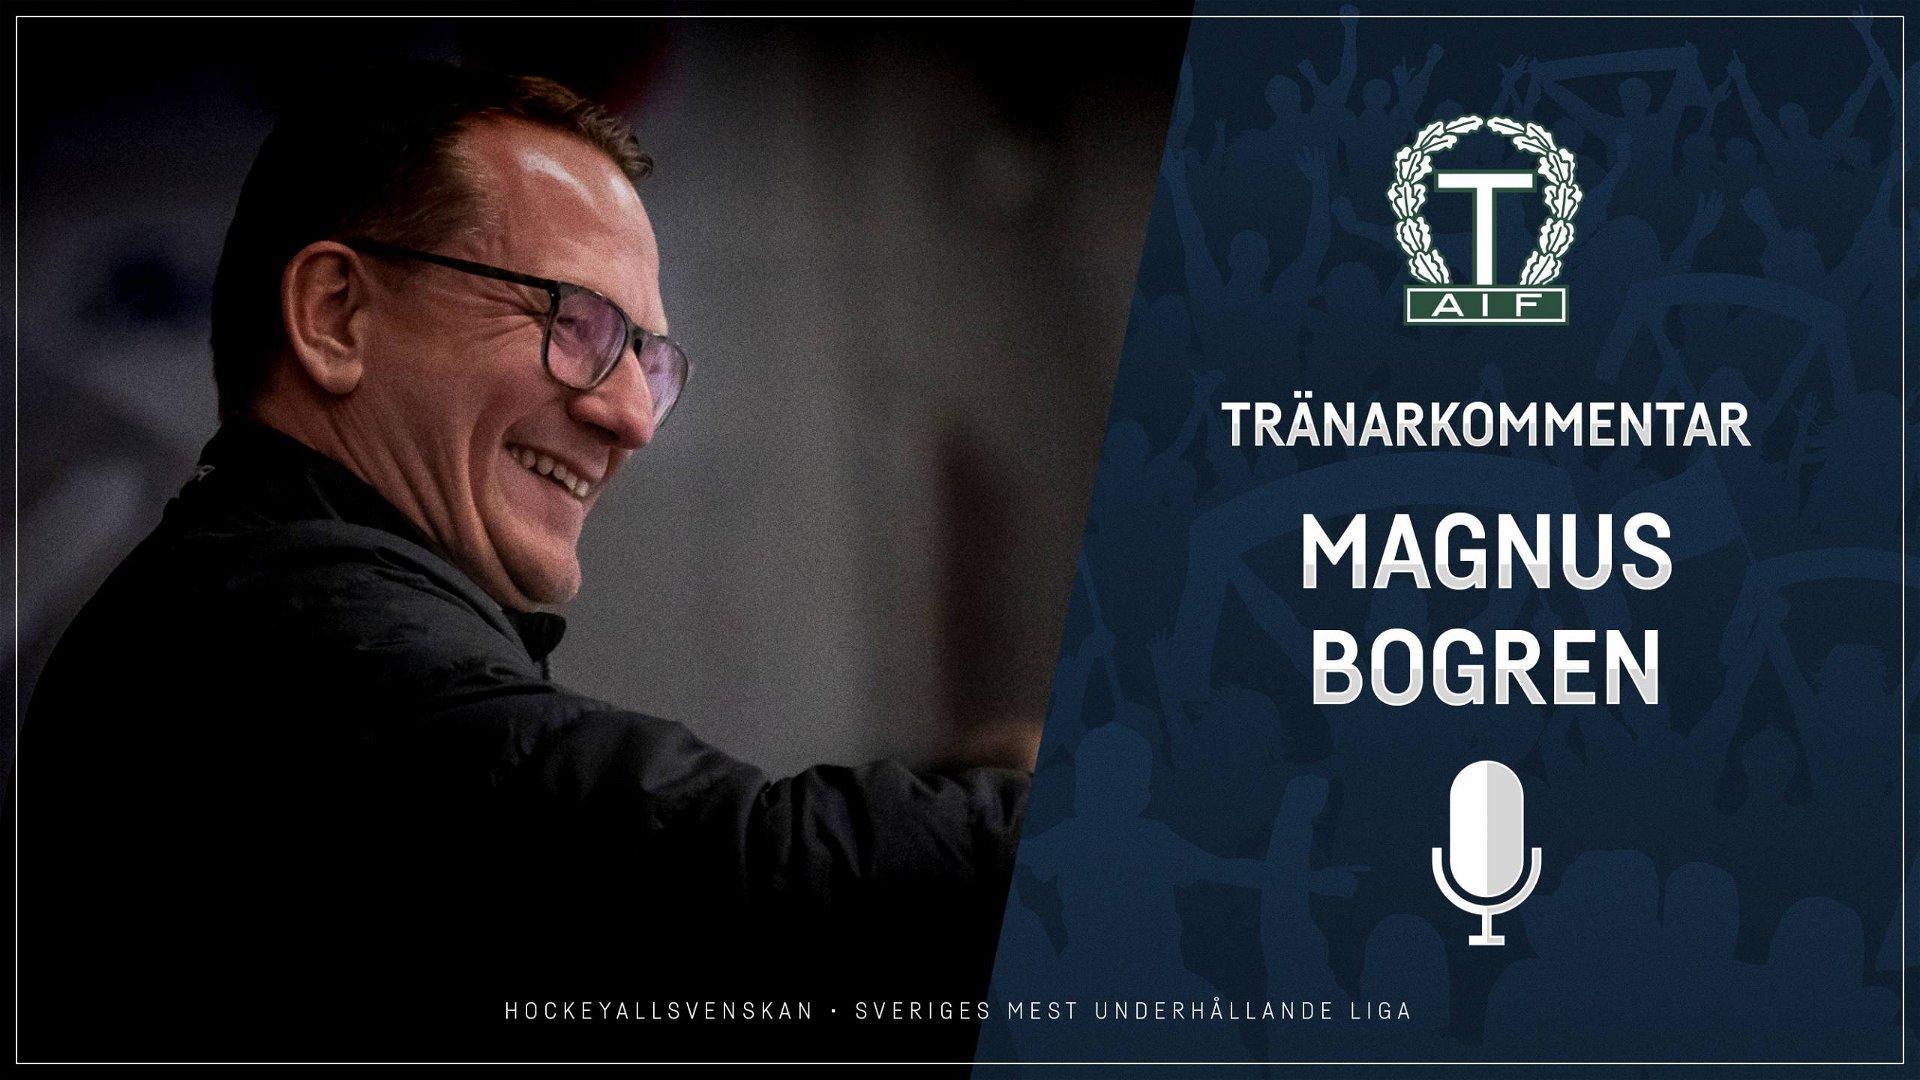 2021-02-12 Segerintervju: Magnus Bogren